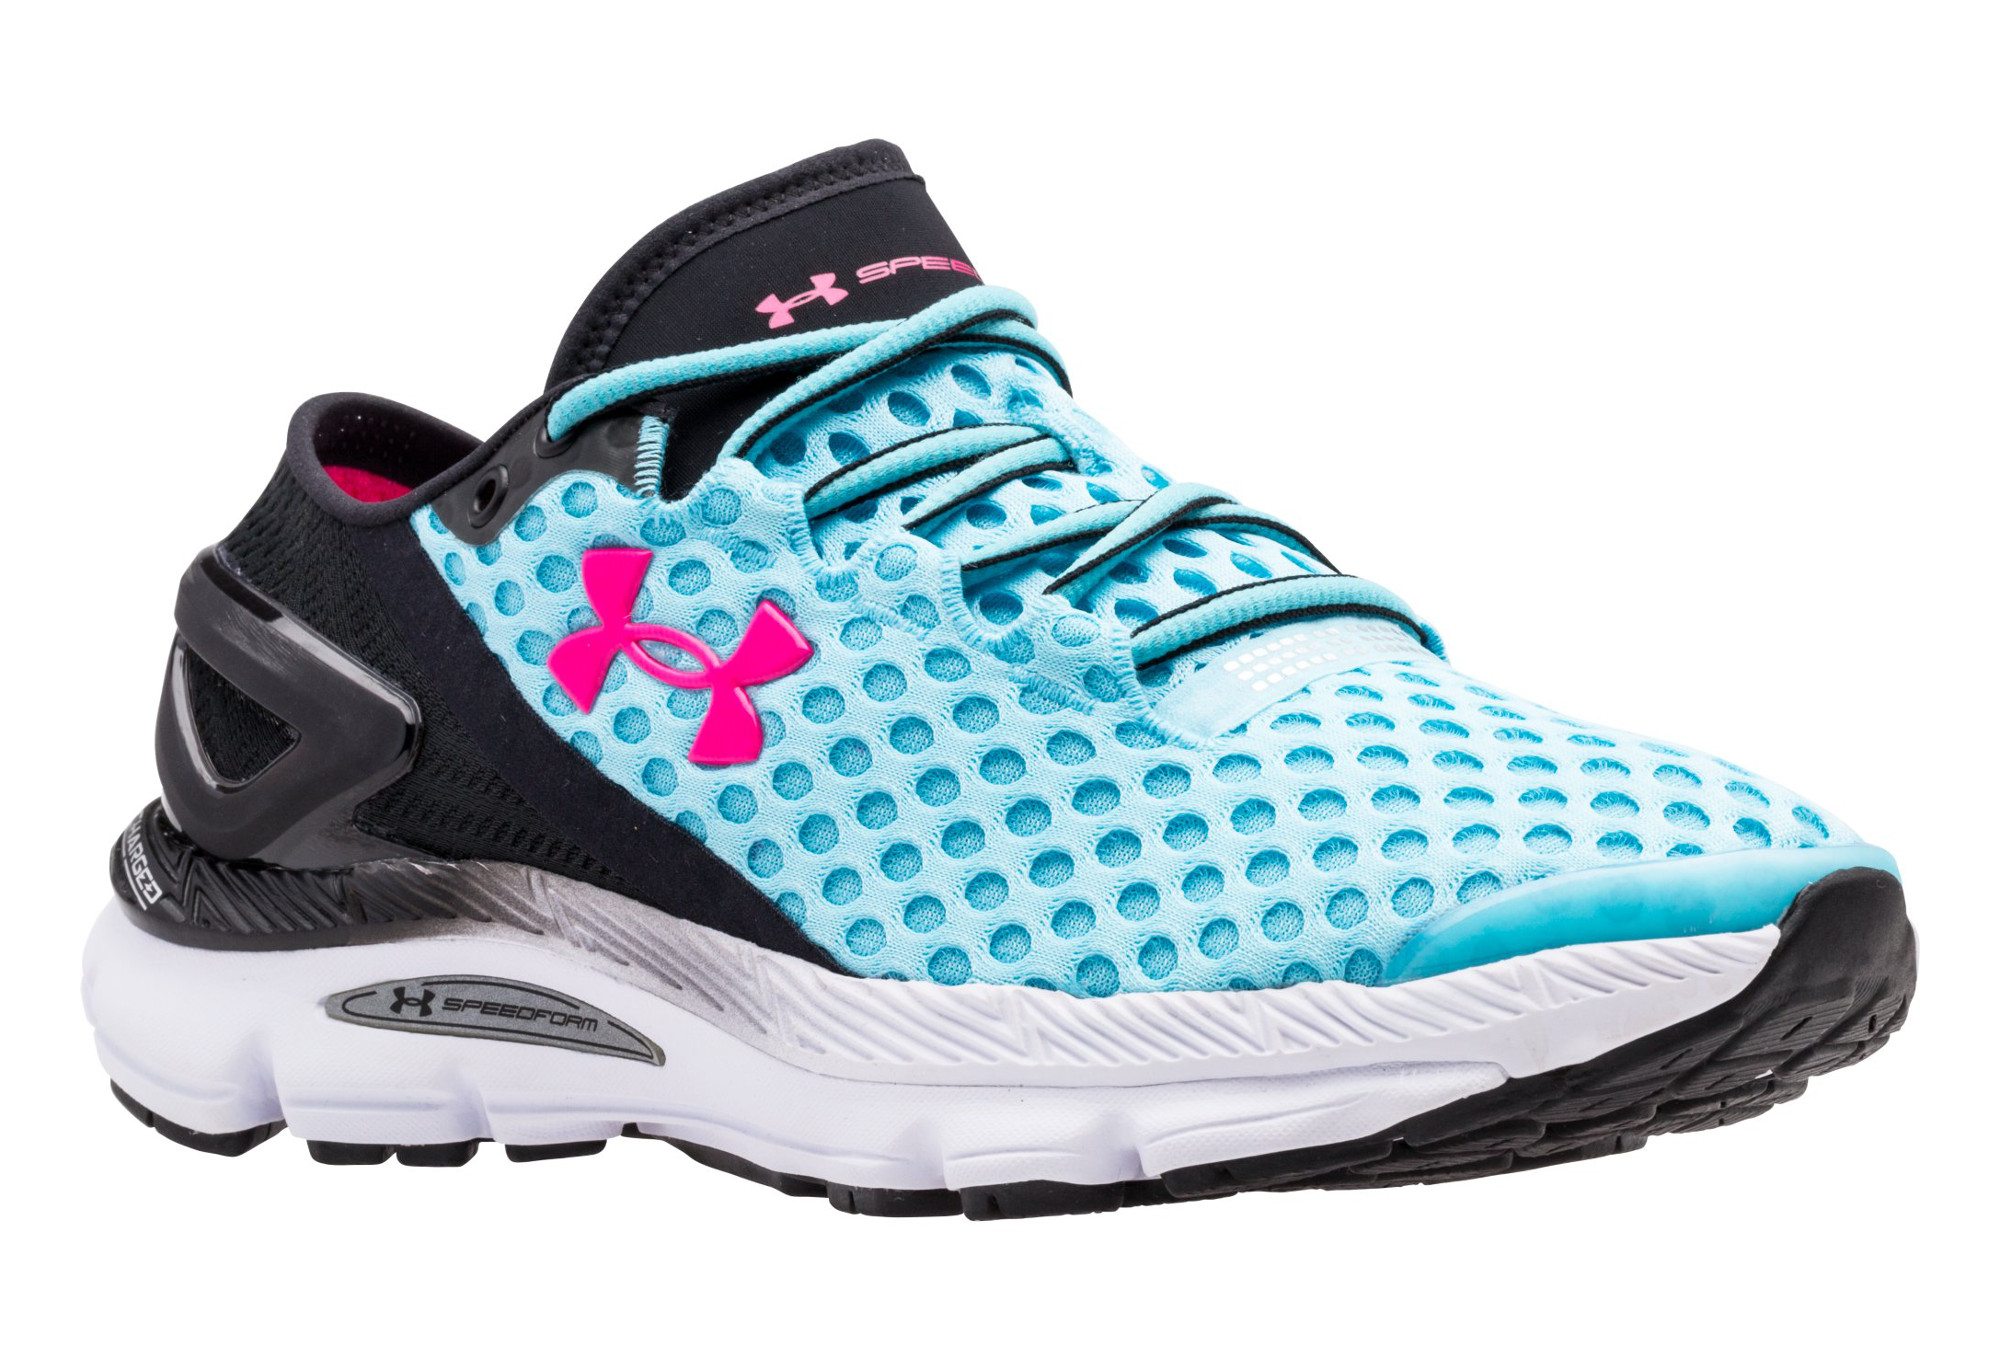 c248675b2d64 UNDER ARMOUR SPEEDFORM GEMINI 2 Pair of Shoes Blue Black Women ...